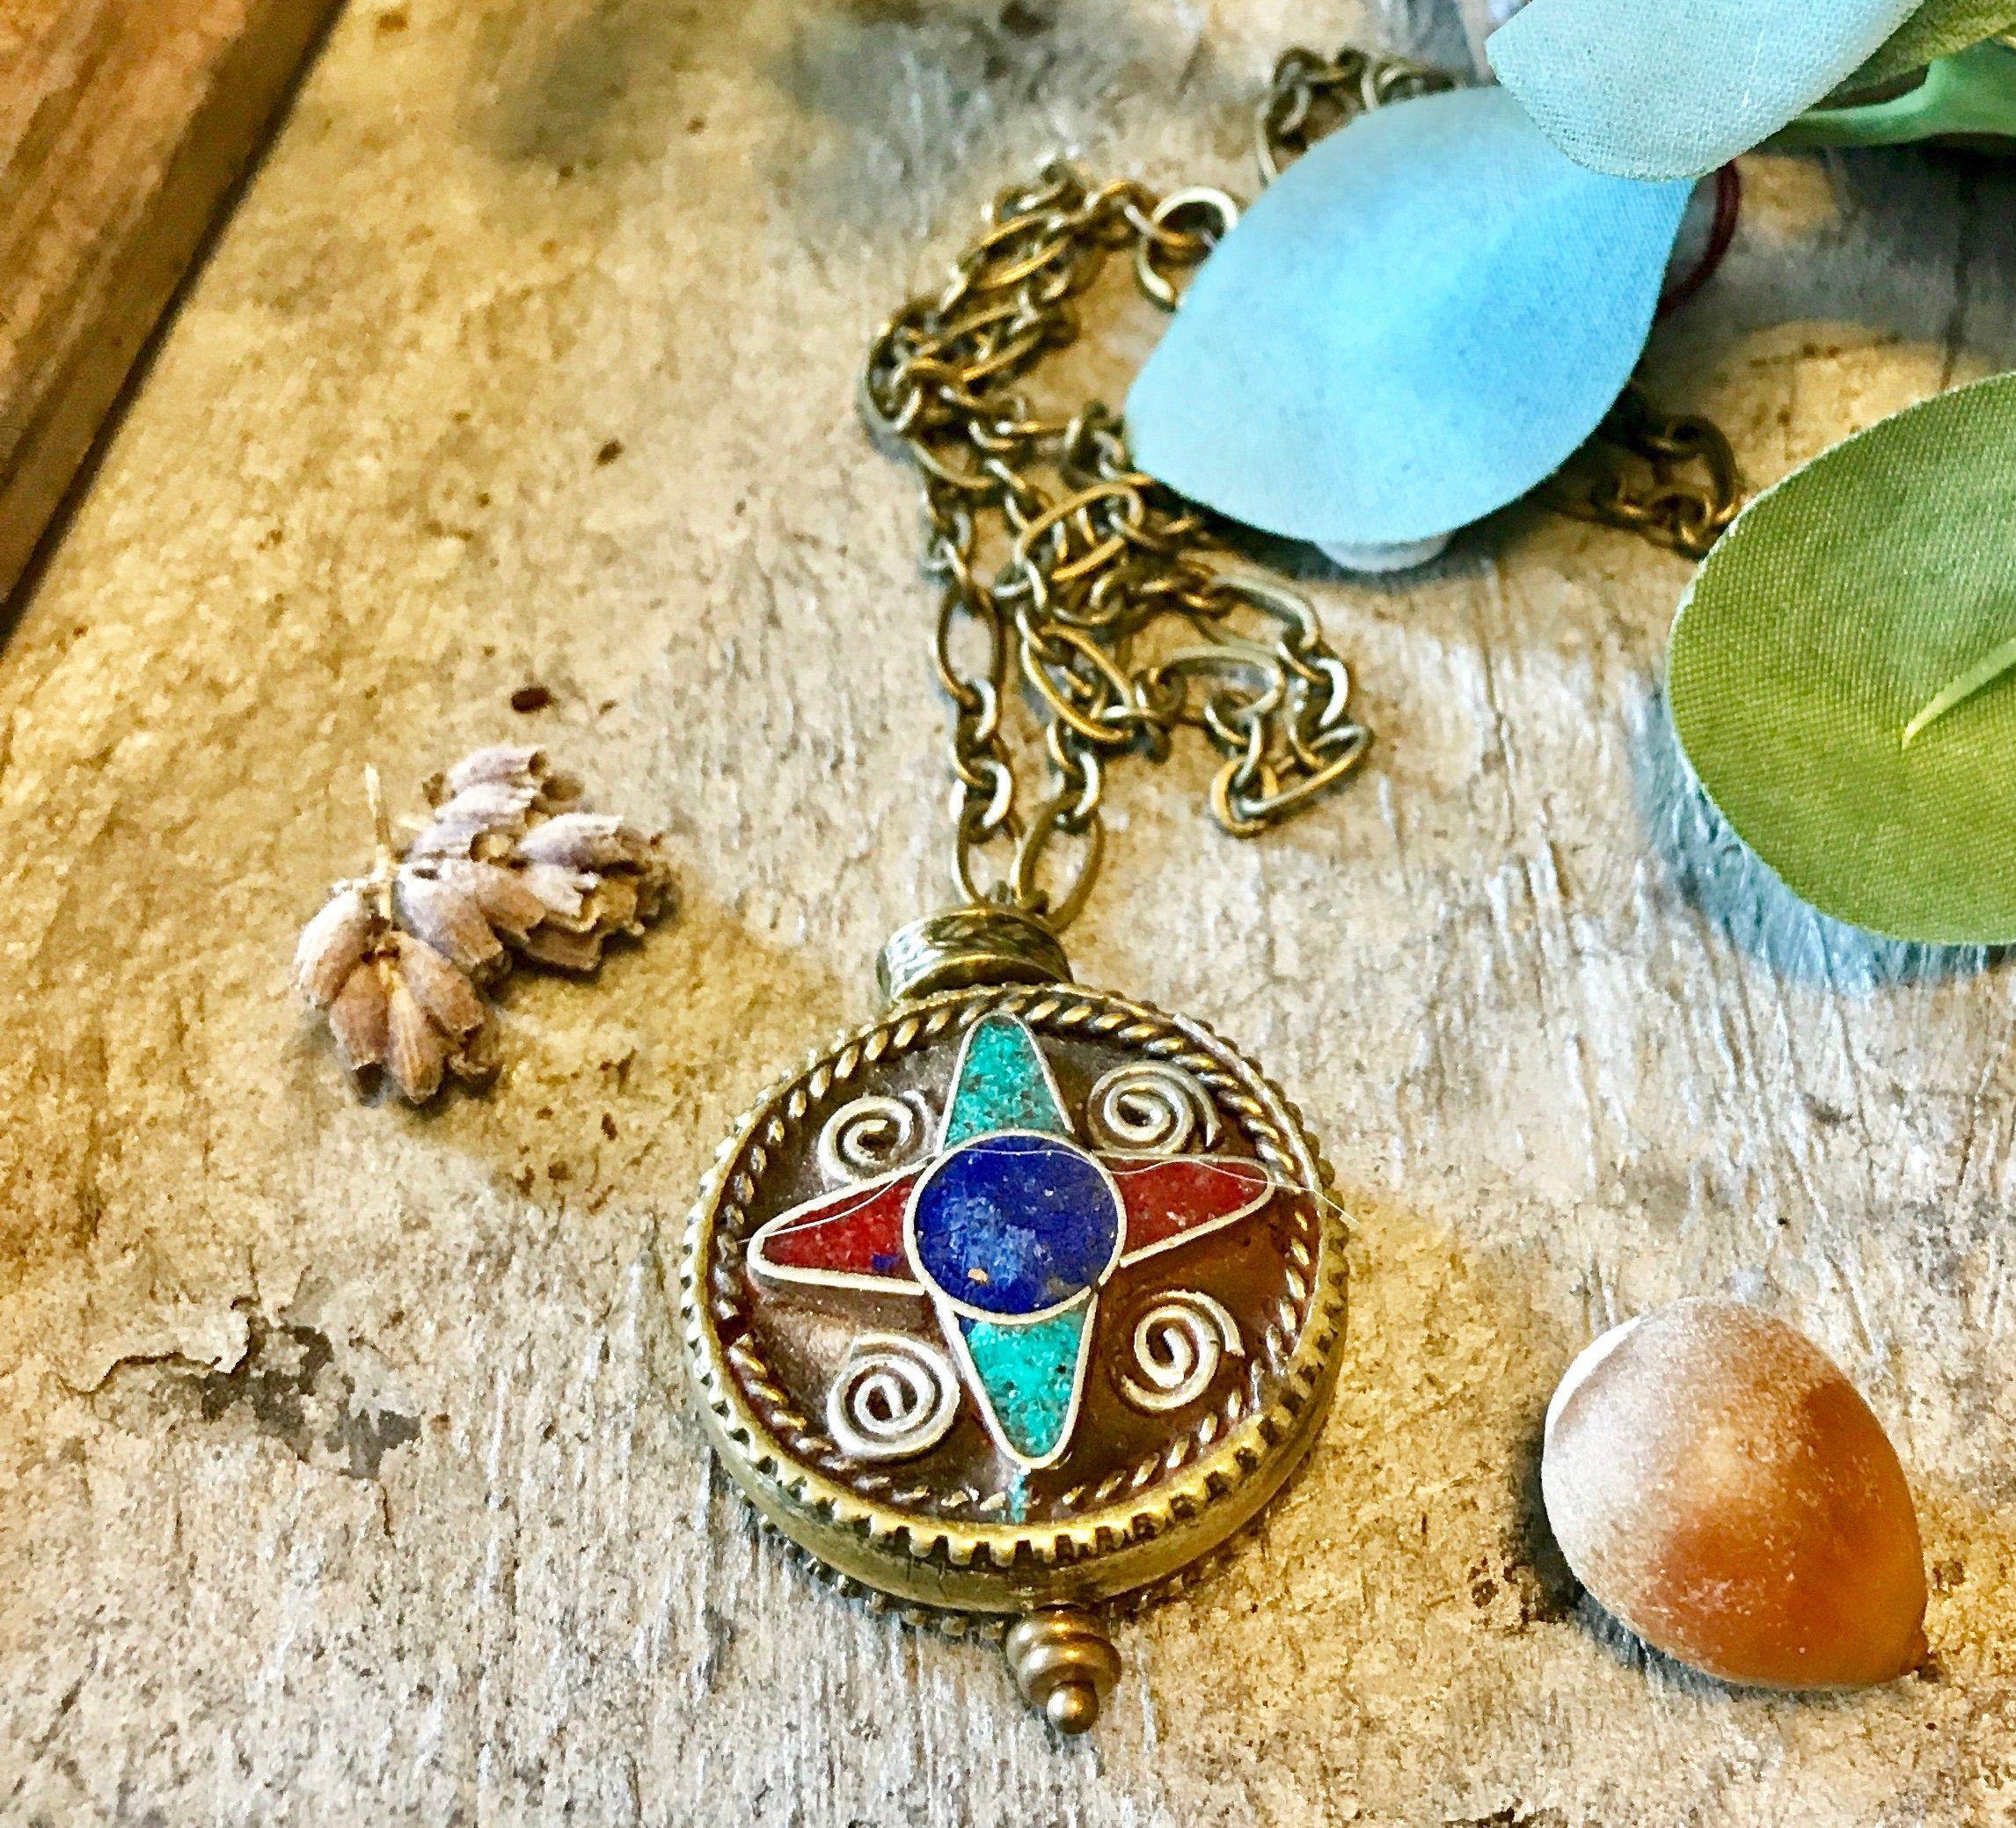 Nepal Tibetan Pendant with Turquoise Lapis /& Coral Inlays  Handmade Tibetan Nepali Jewelry  Large Bohemian Pendant Ethnic Tribal Pendant